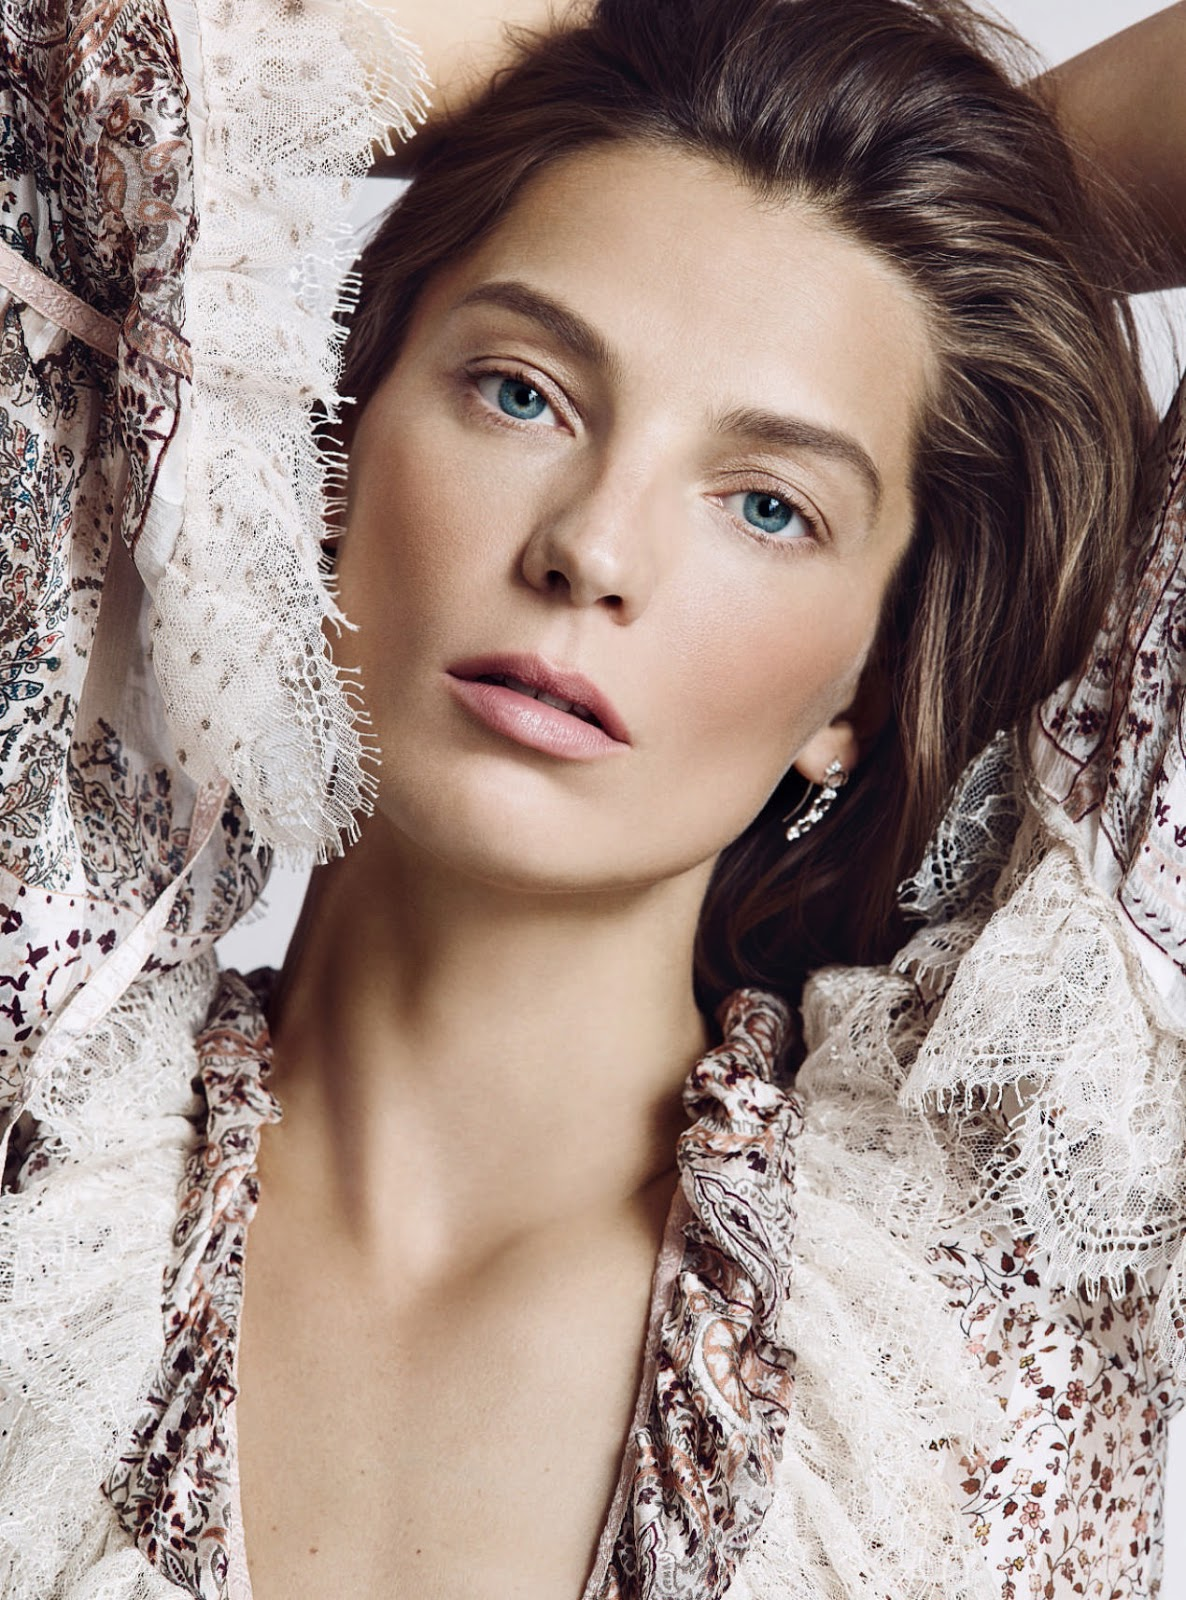 Daria Werbowy Shines On Fashion Canada S October 2013: Daria Werbowy By Nico For Uk Harper's Bazaar May 2016